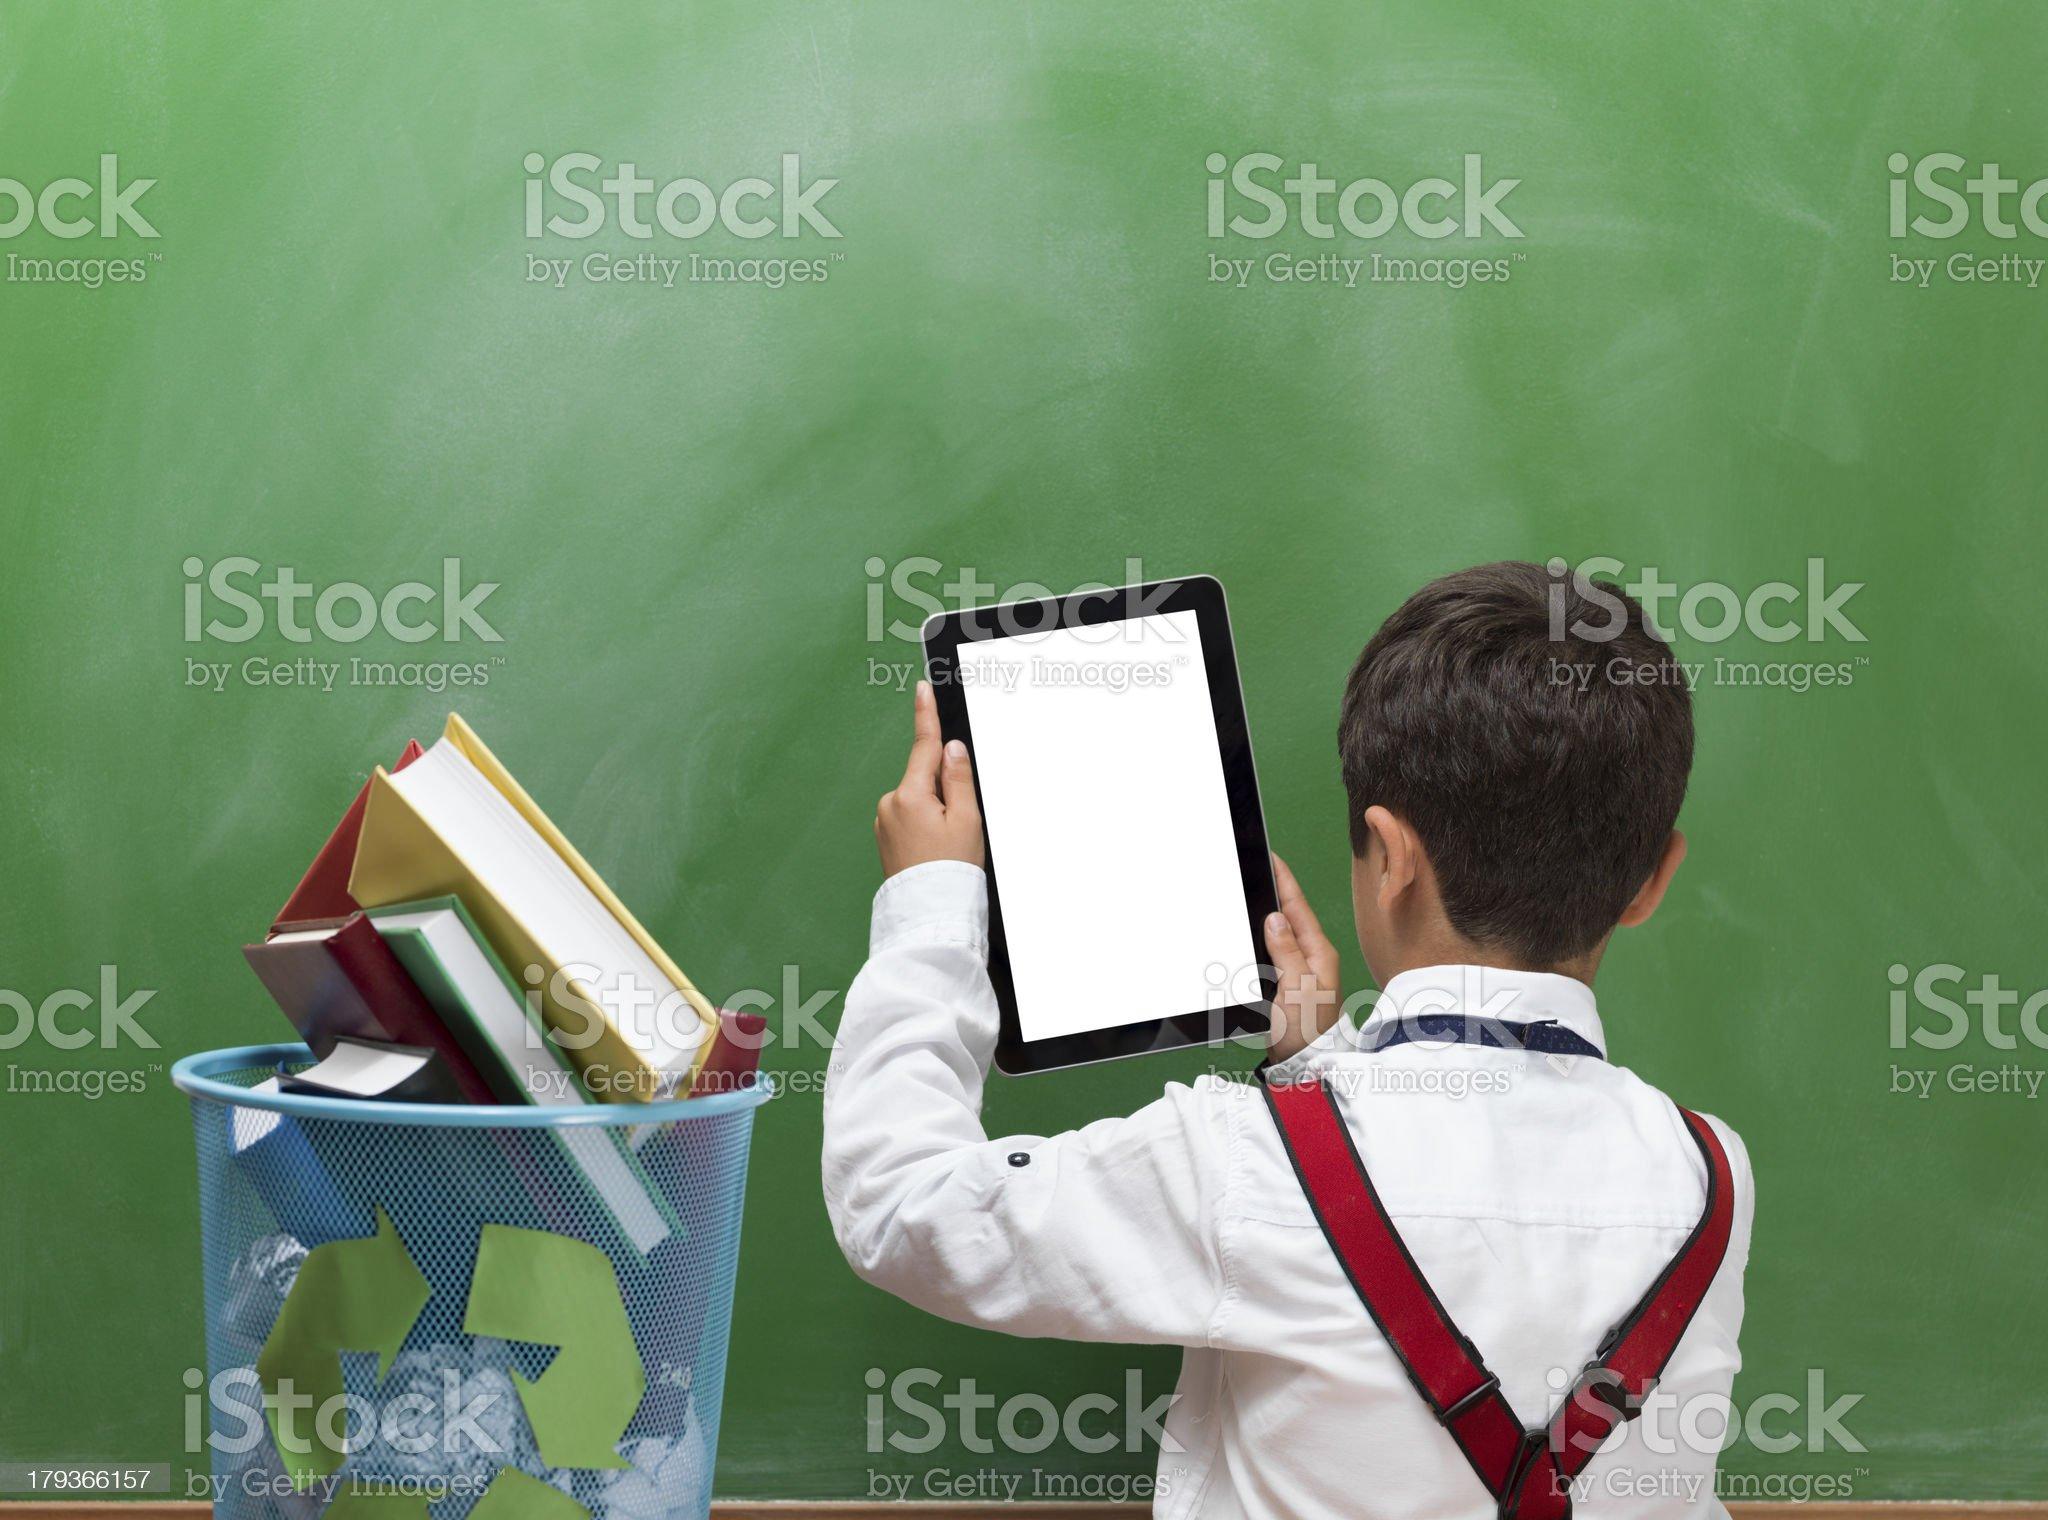 Little boy leaving books in recycling bin, using digital tablet royalty-free stock photo